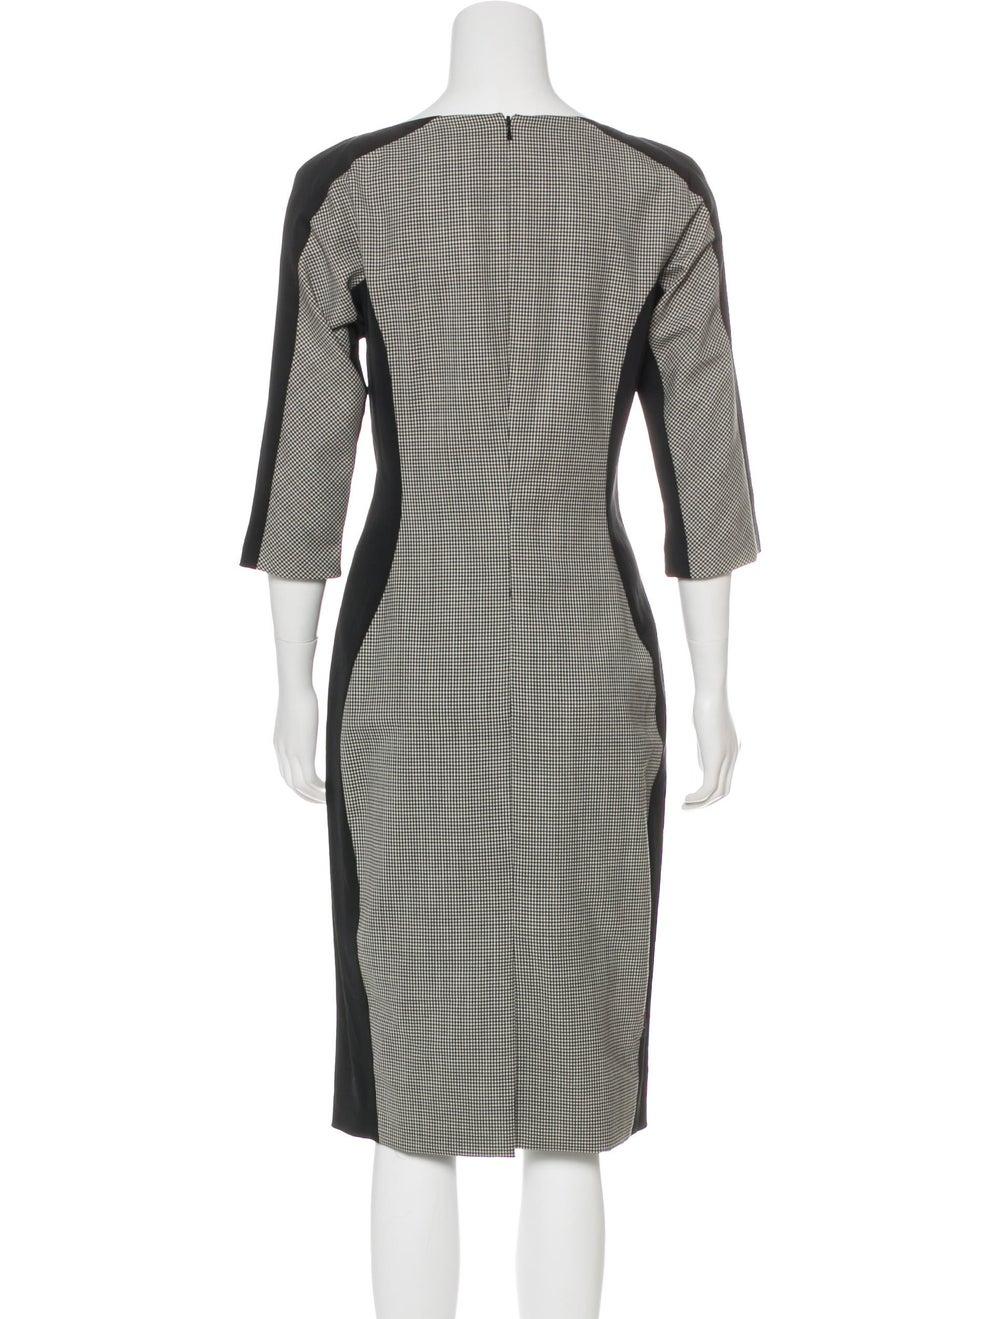 Lela Rose Wool Houndstooth Dress Grey - image 3